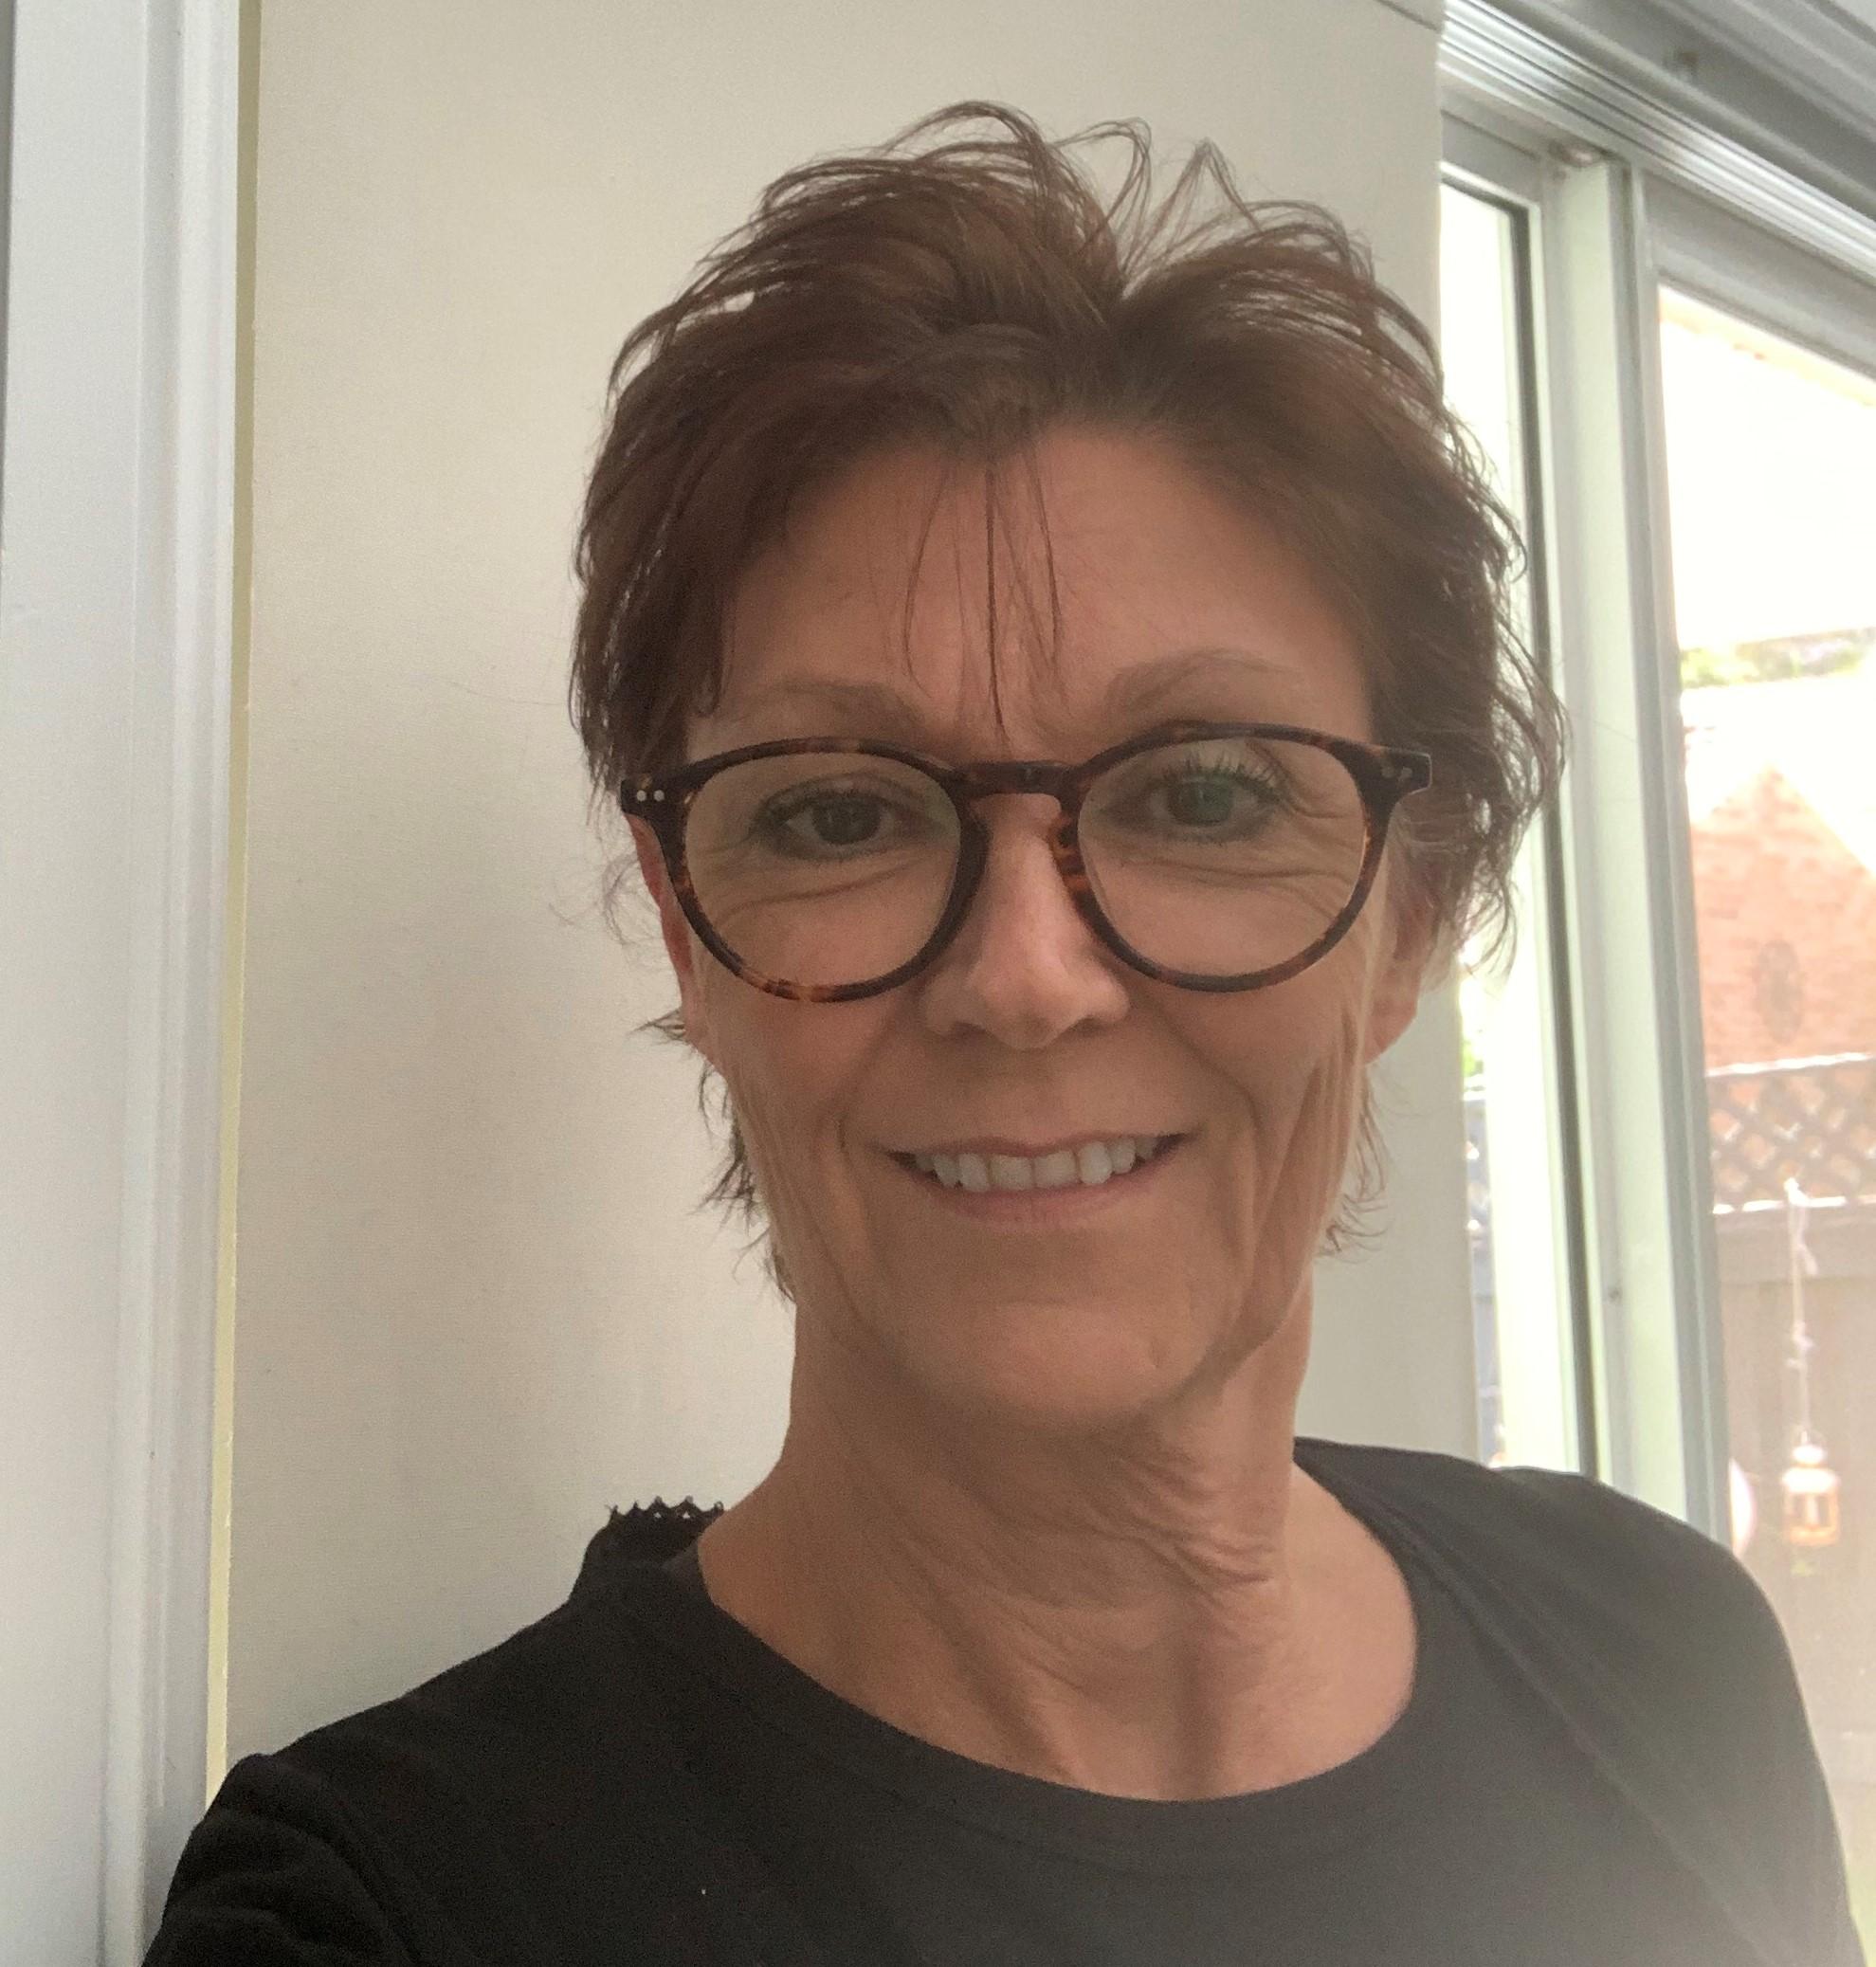 Ingrid Glatz